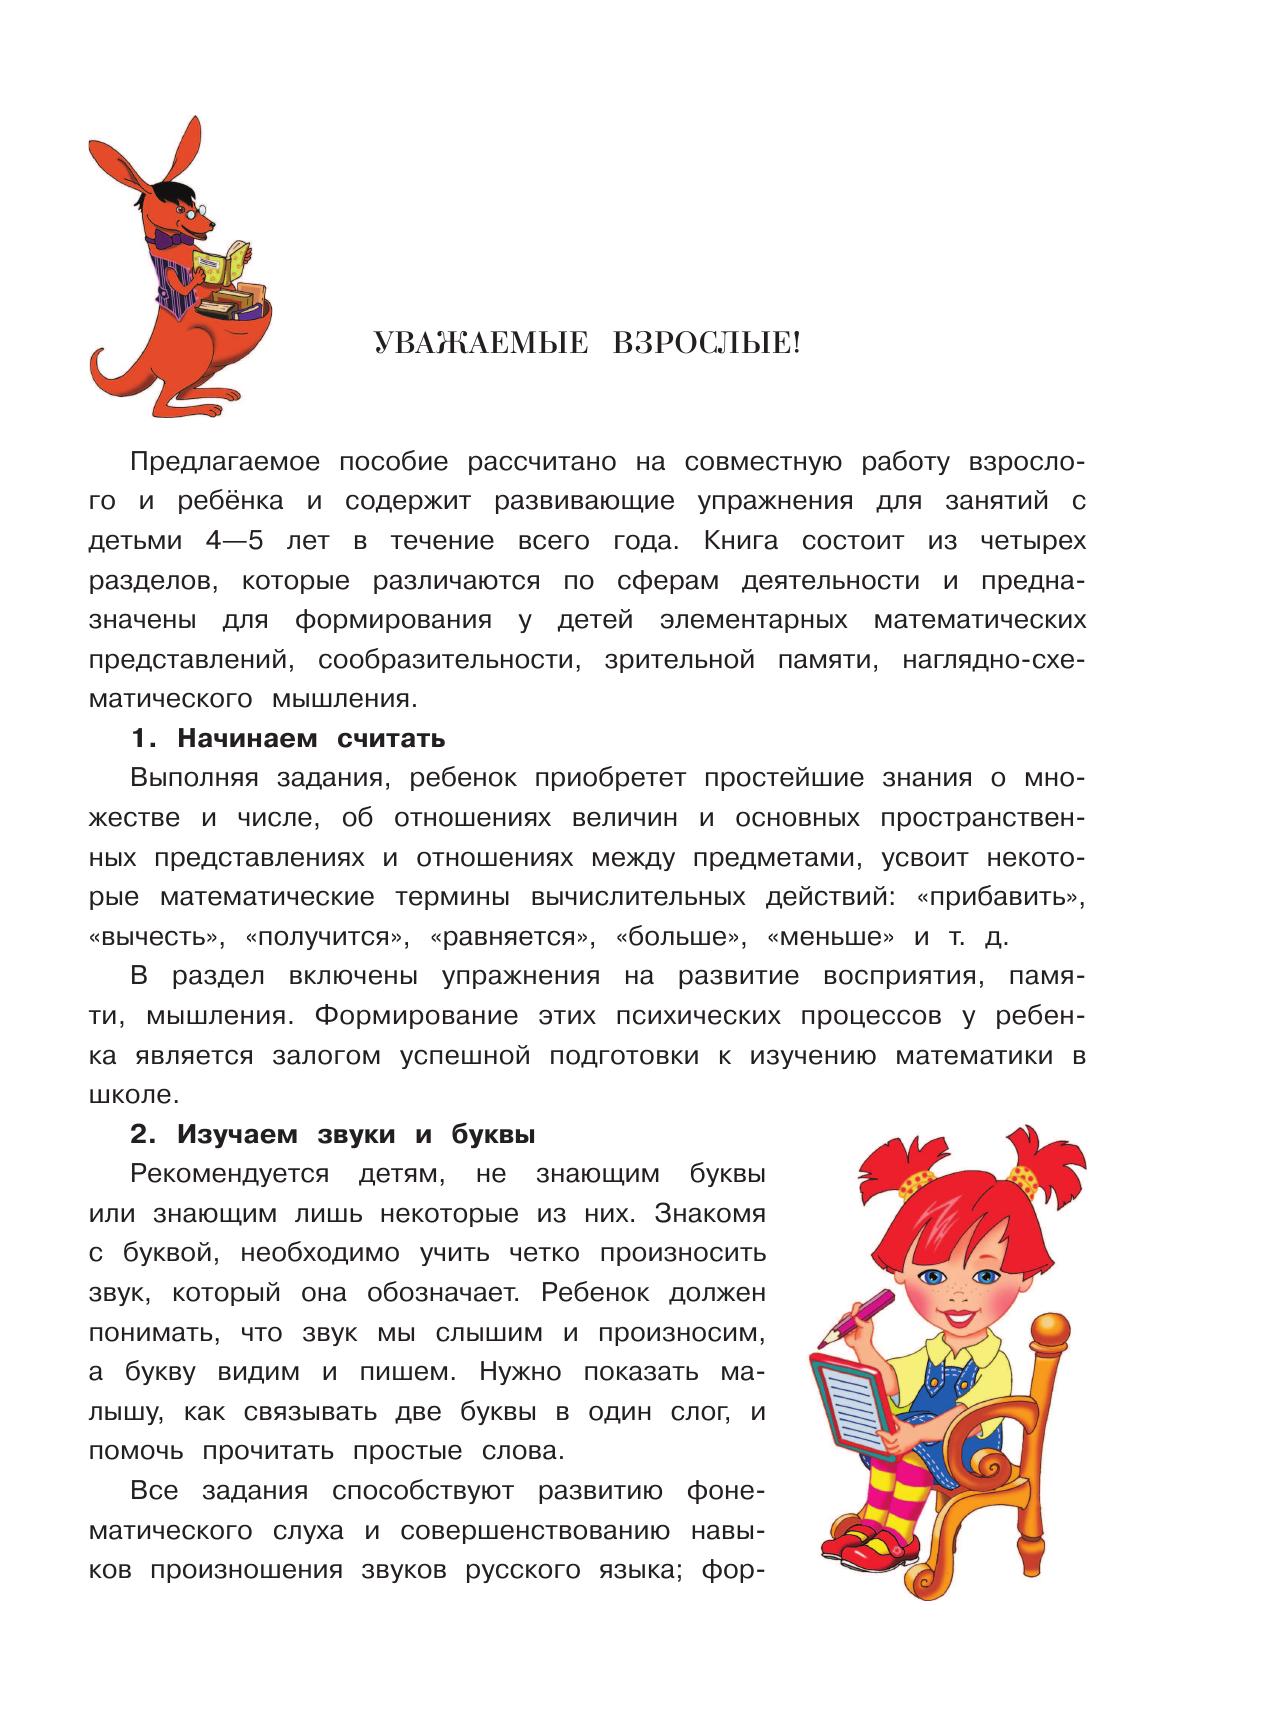 Картинки для занятий детям 4 5 лет